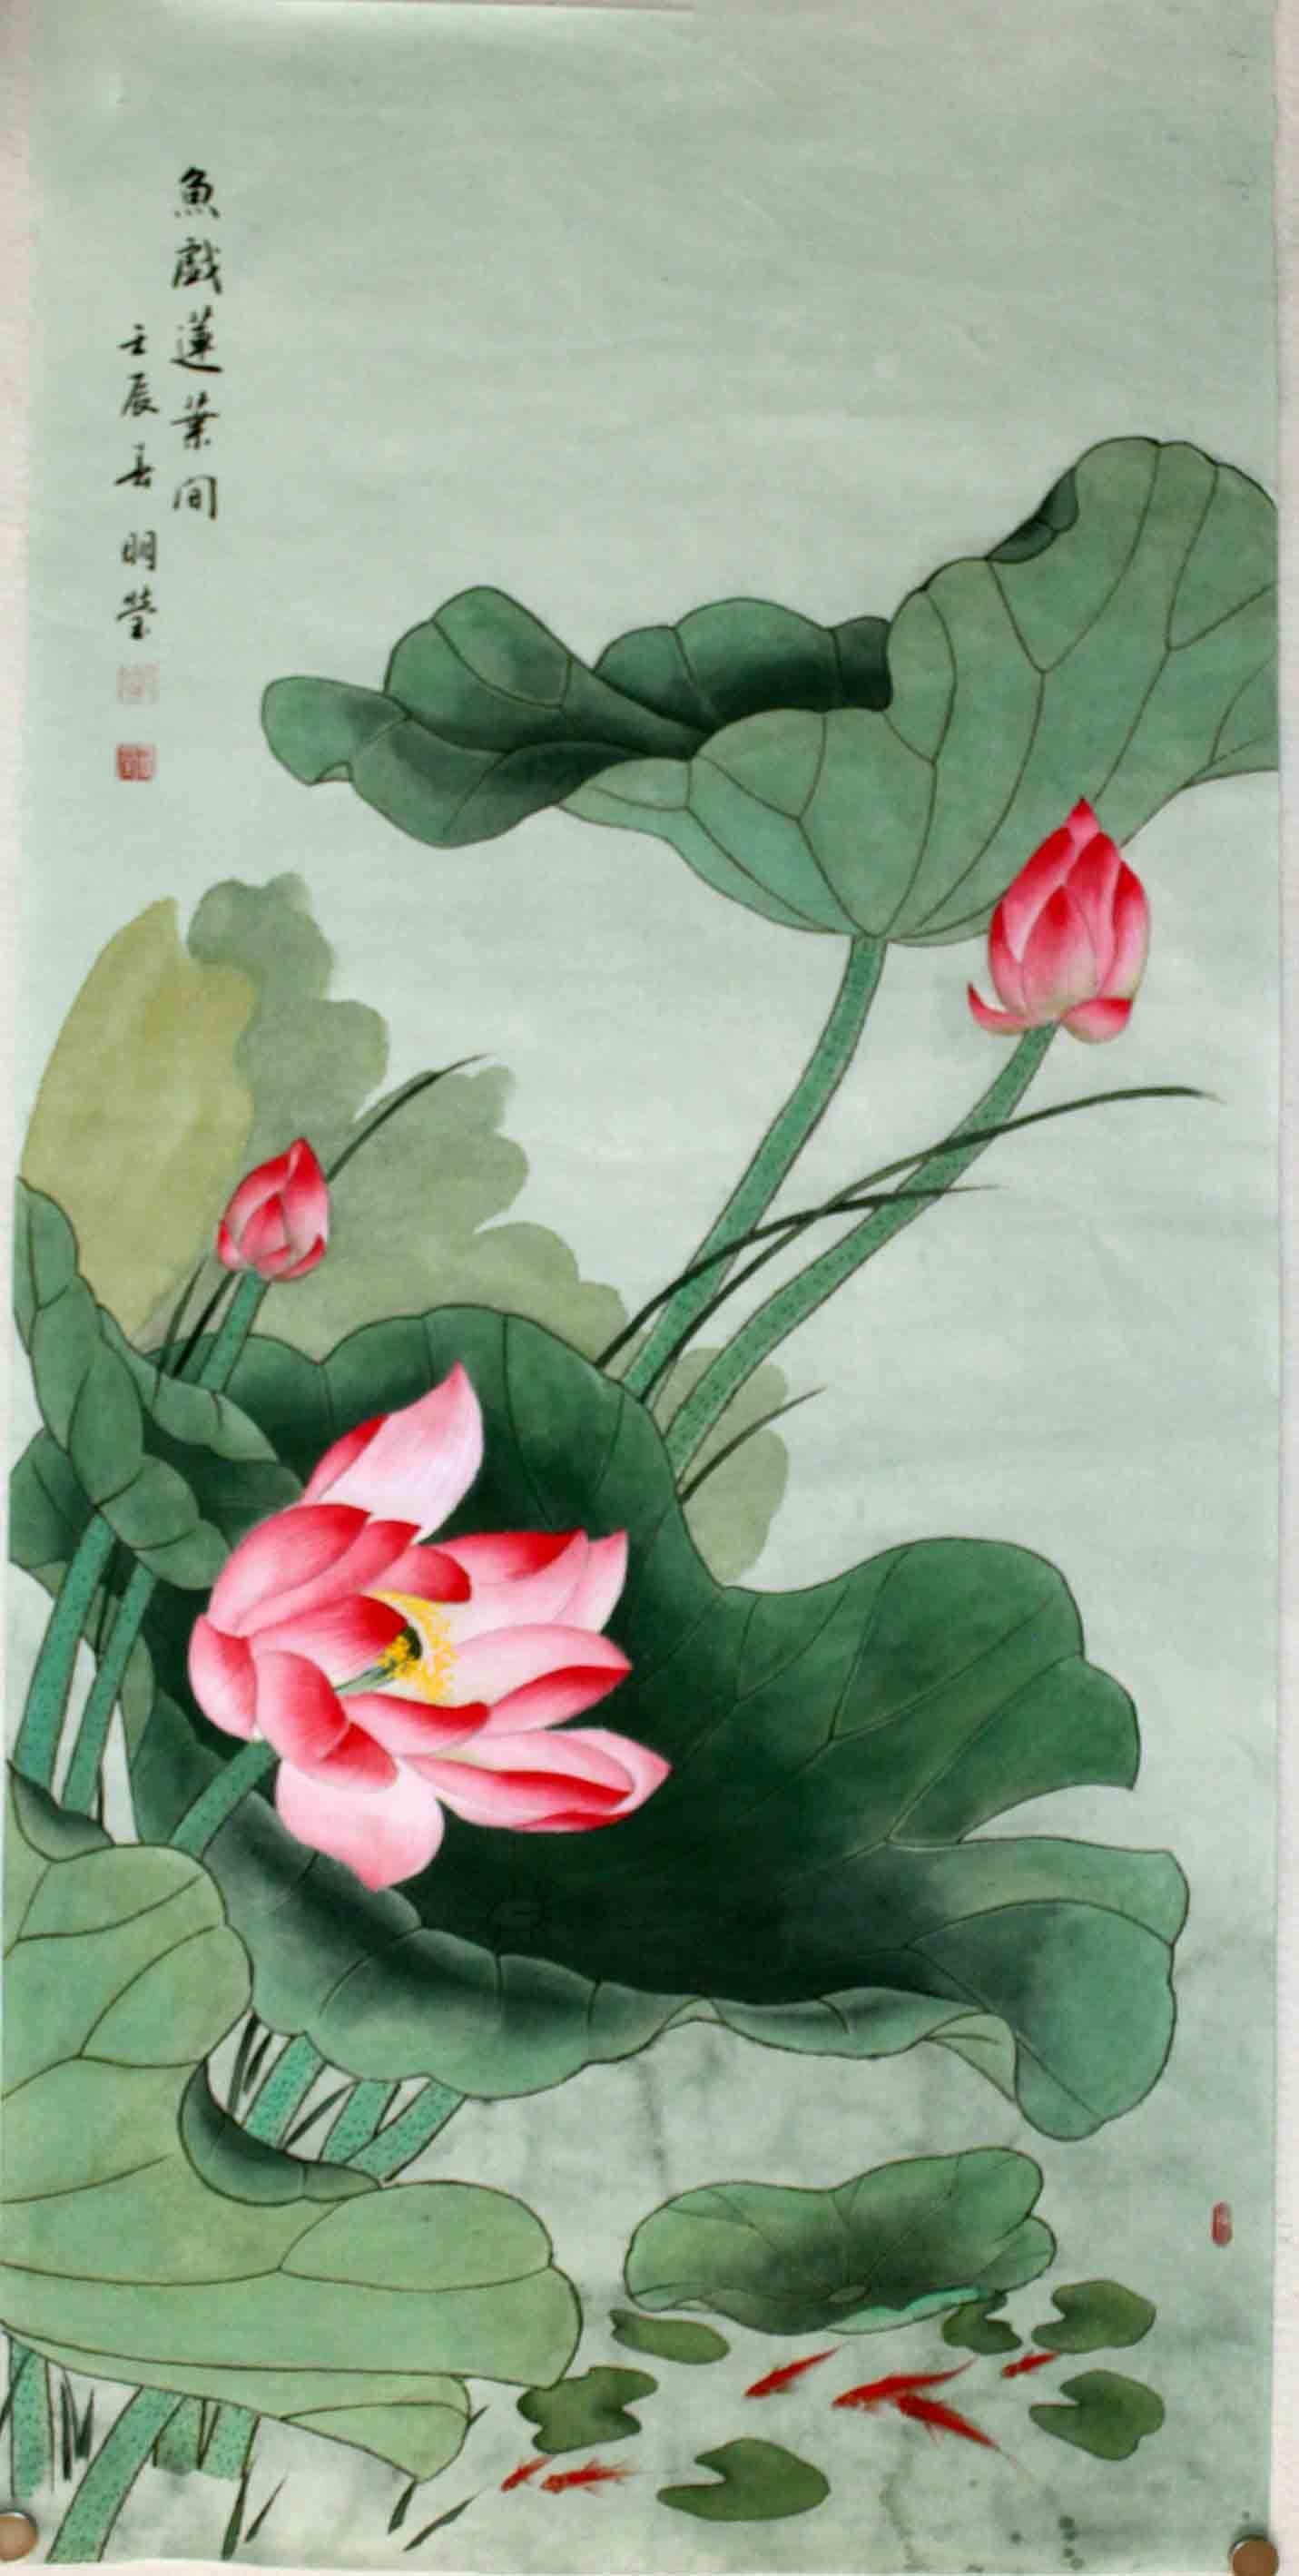 Chinese painting lotus chinese painting cnag234420 artisoo lotus chinese paintingcnag234420 izmirmasajfo